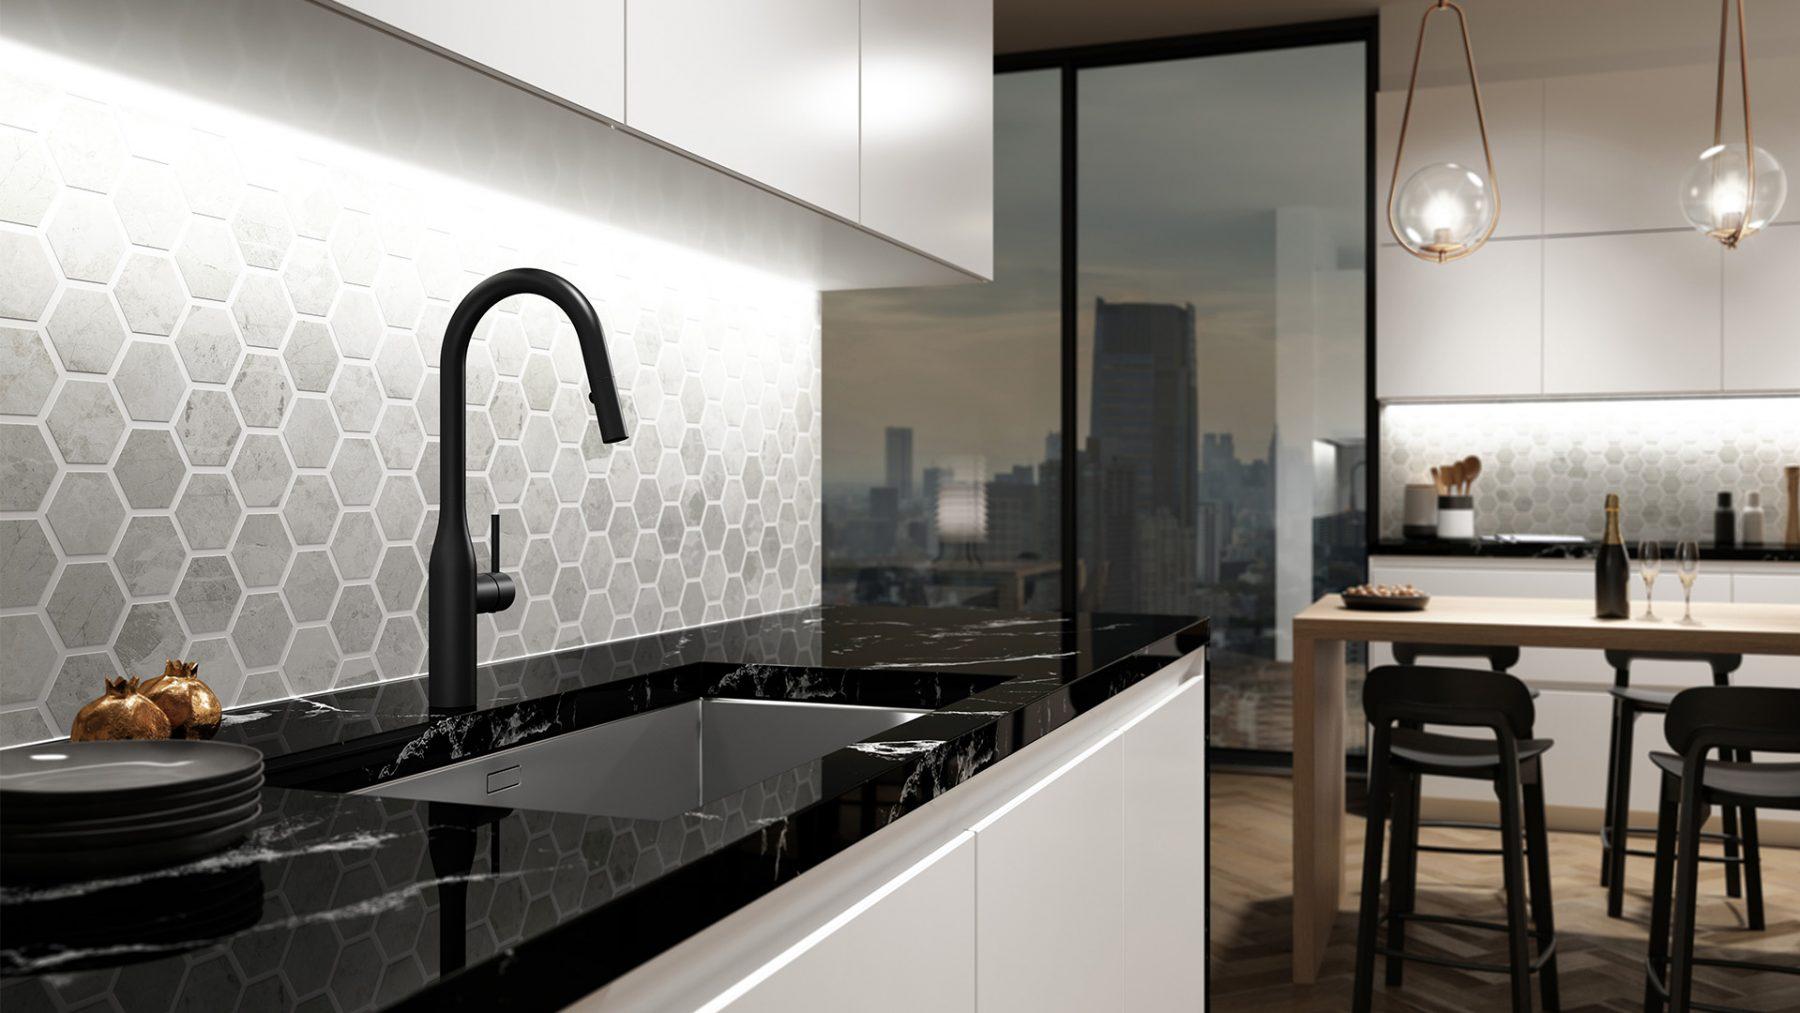 3d design nightlife kitchen black tap